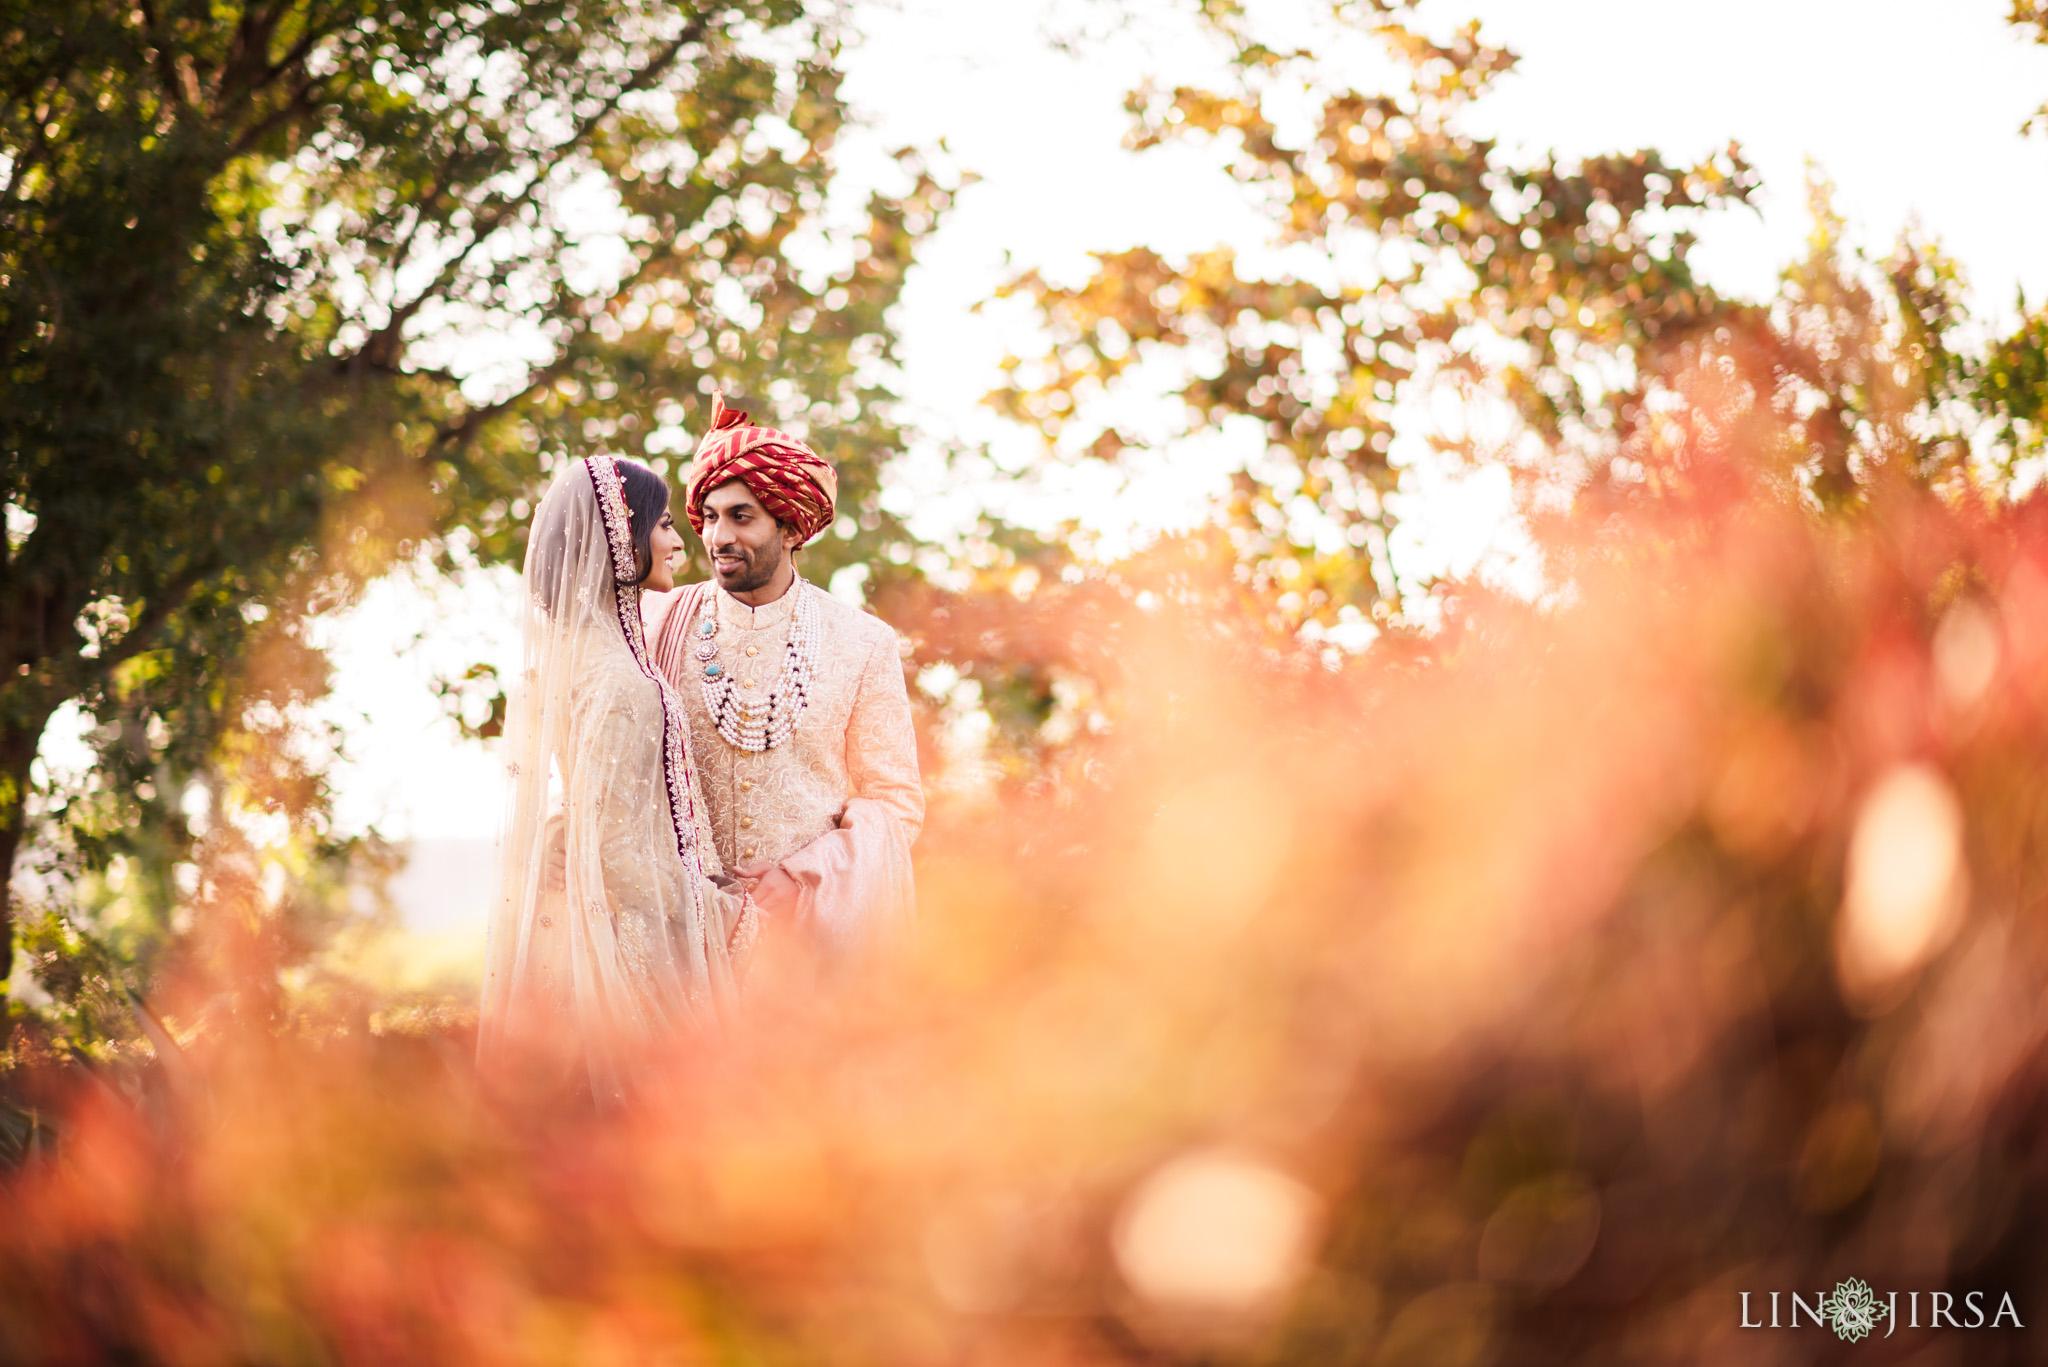 016 four seasons westlake village muslim wedding photography